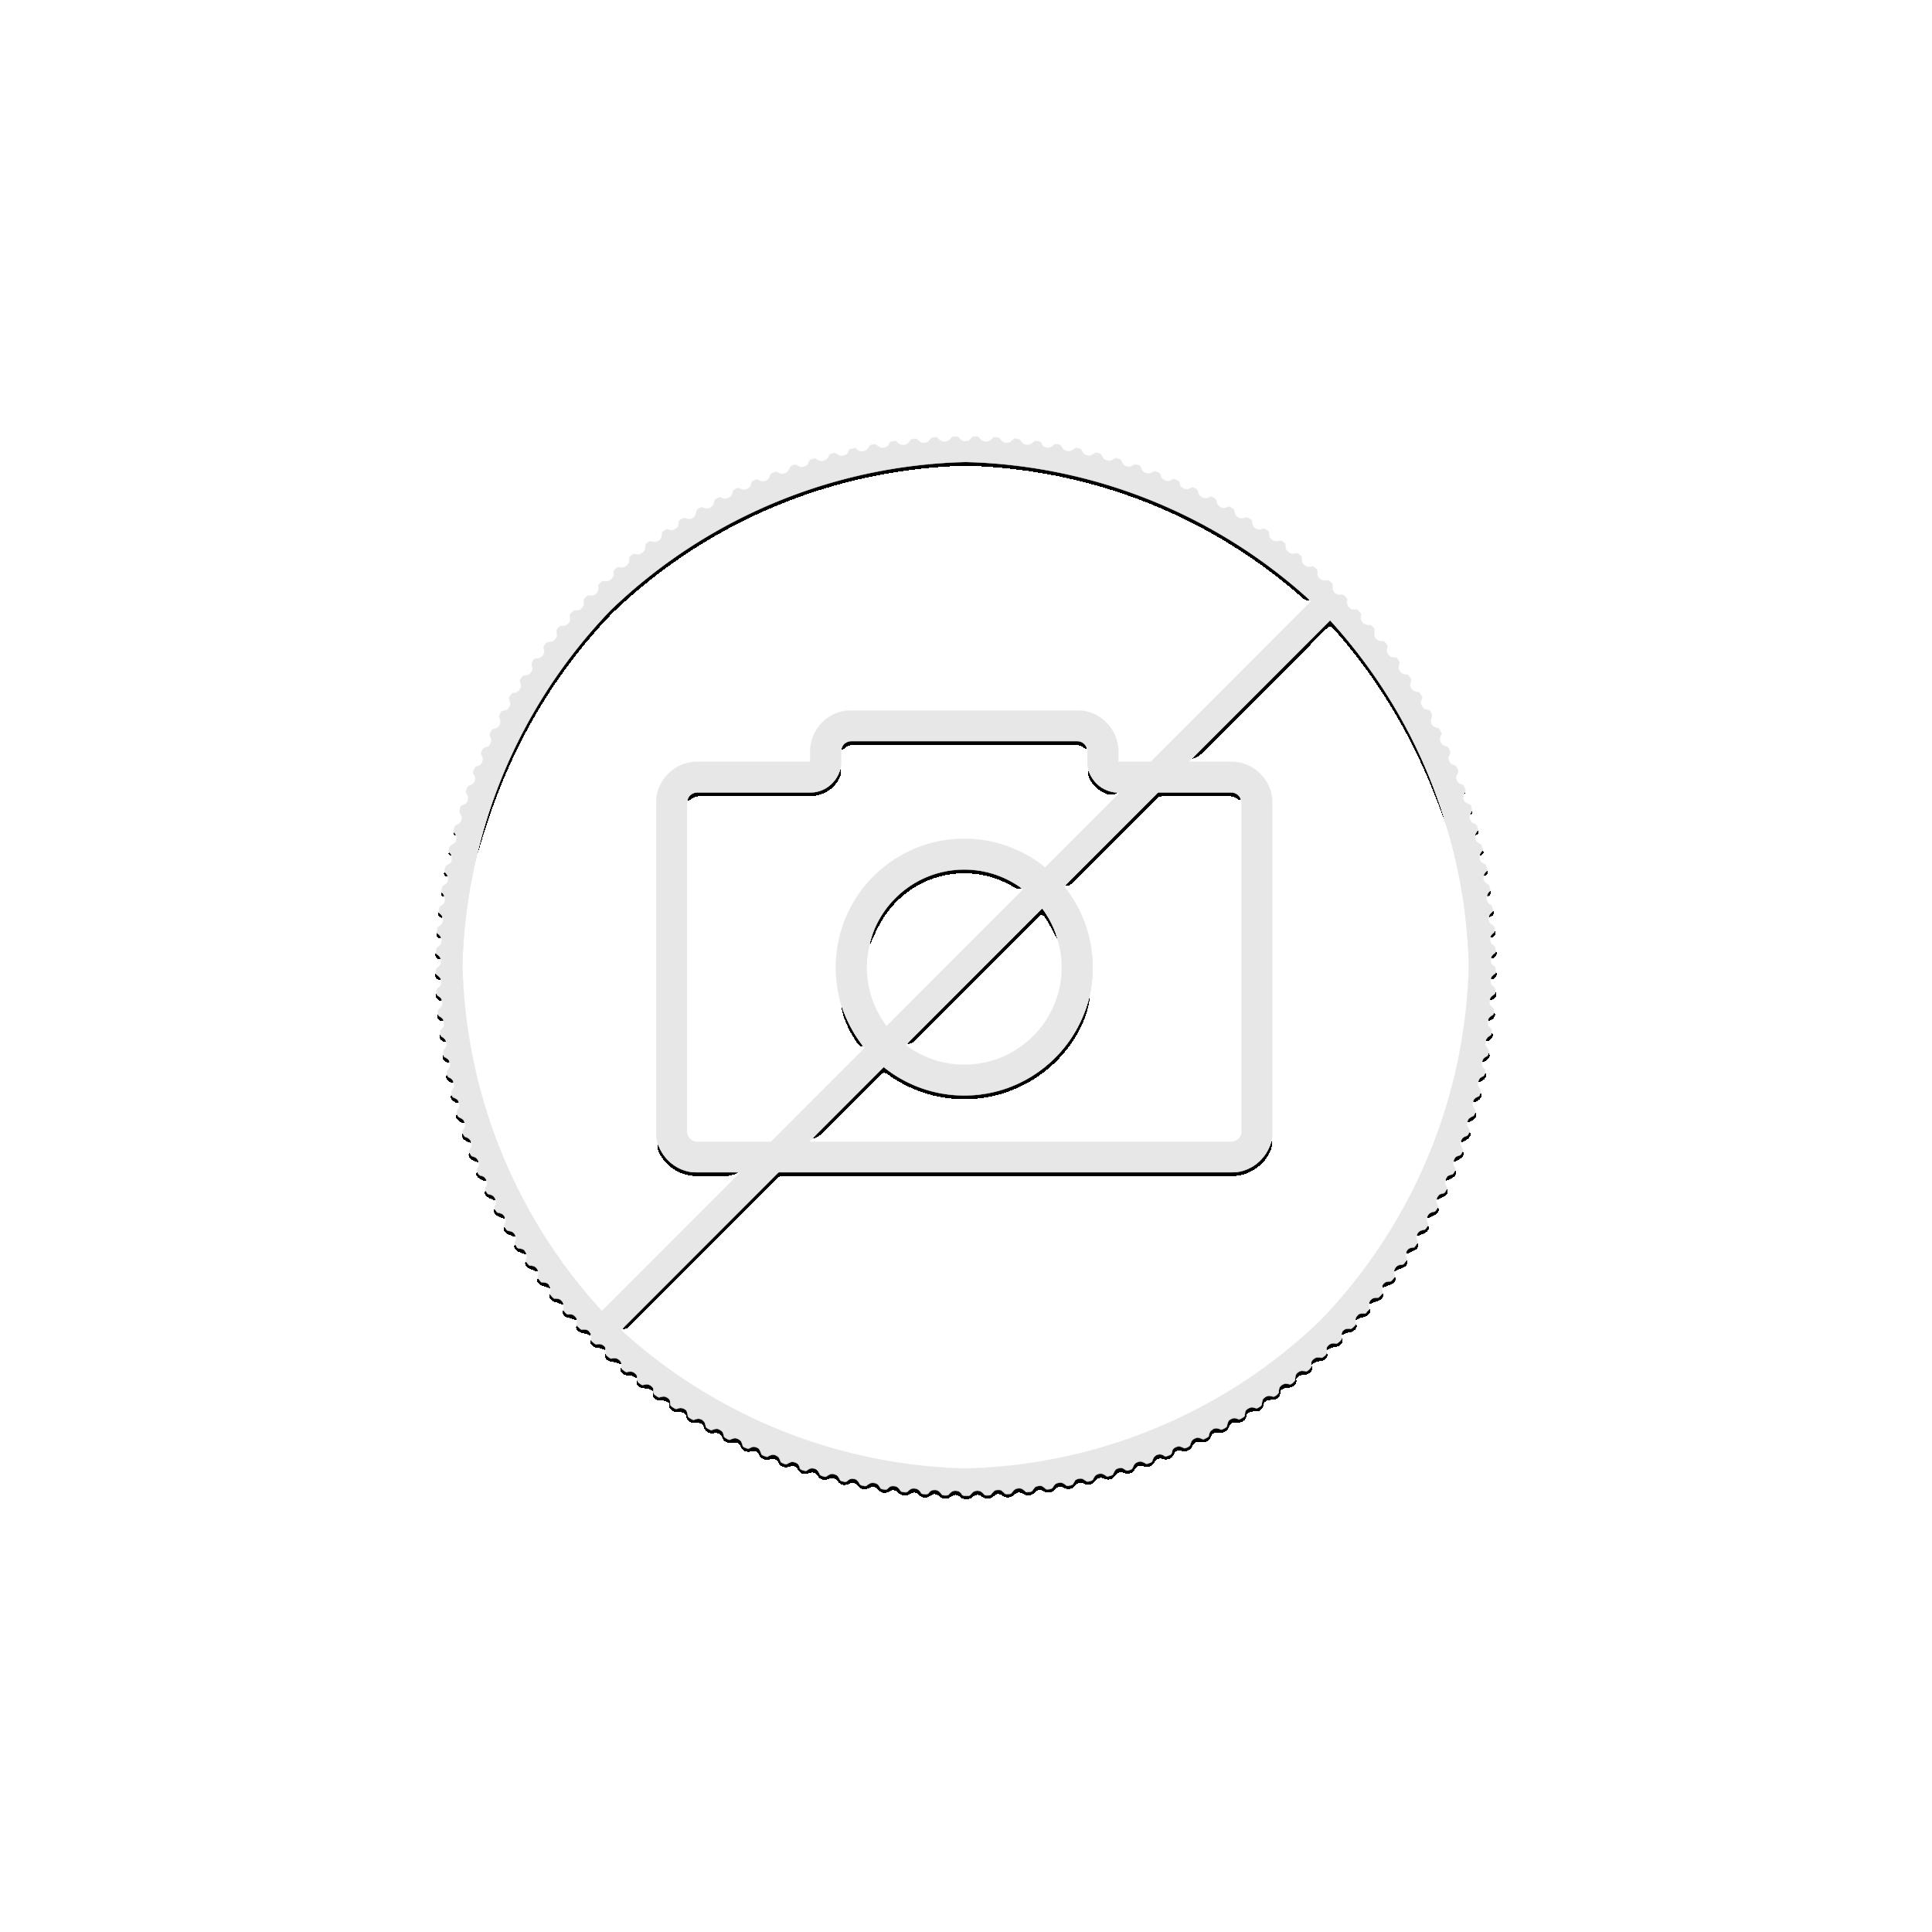 1 Troy ounce platina Wiener Philharmoniker munt 2018